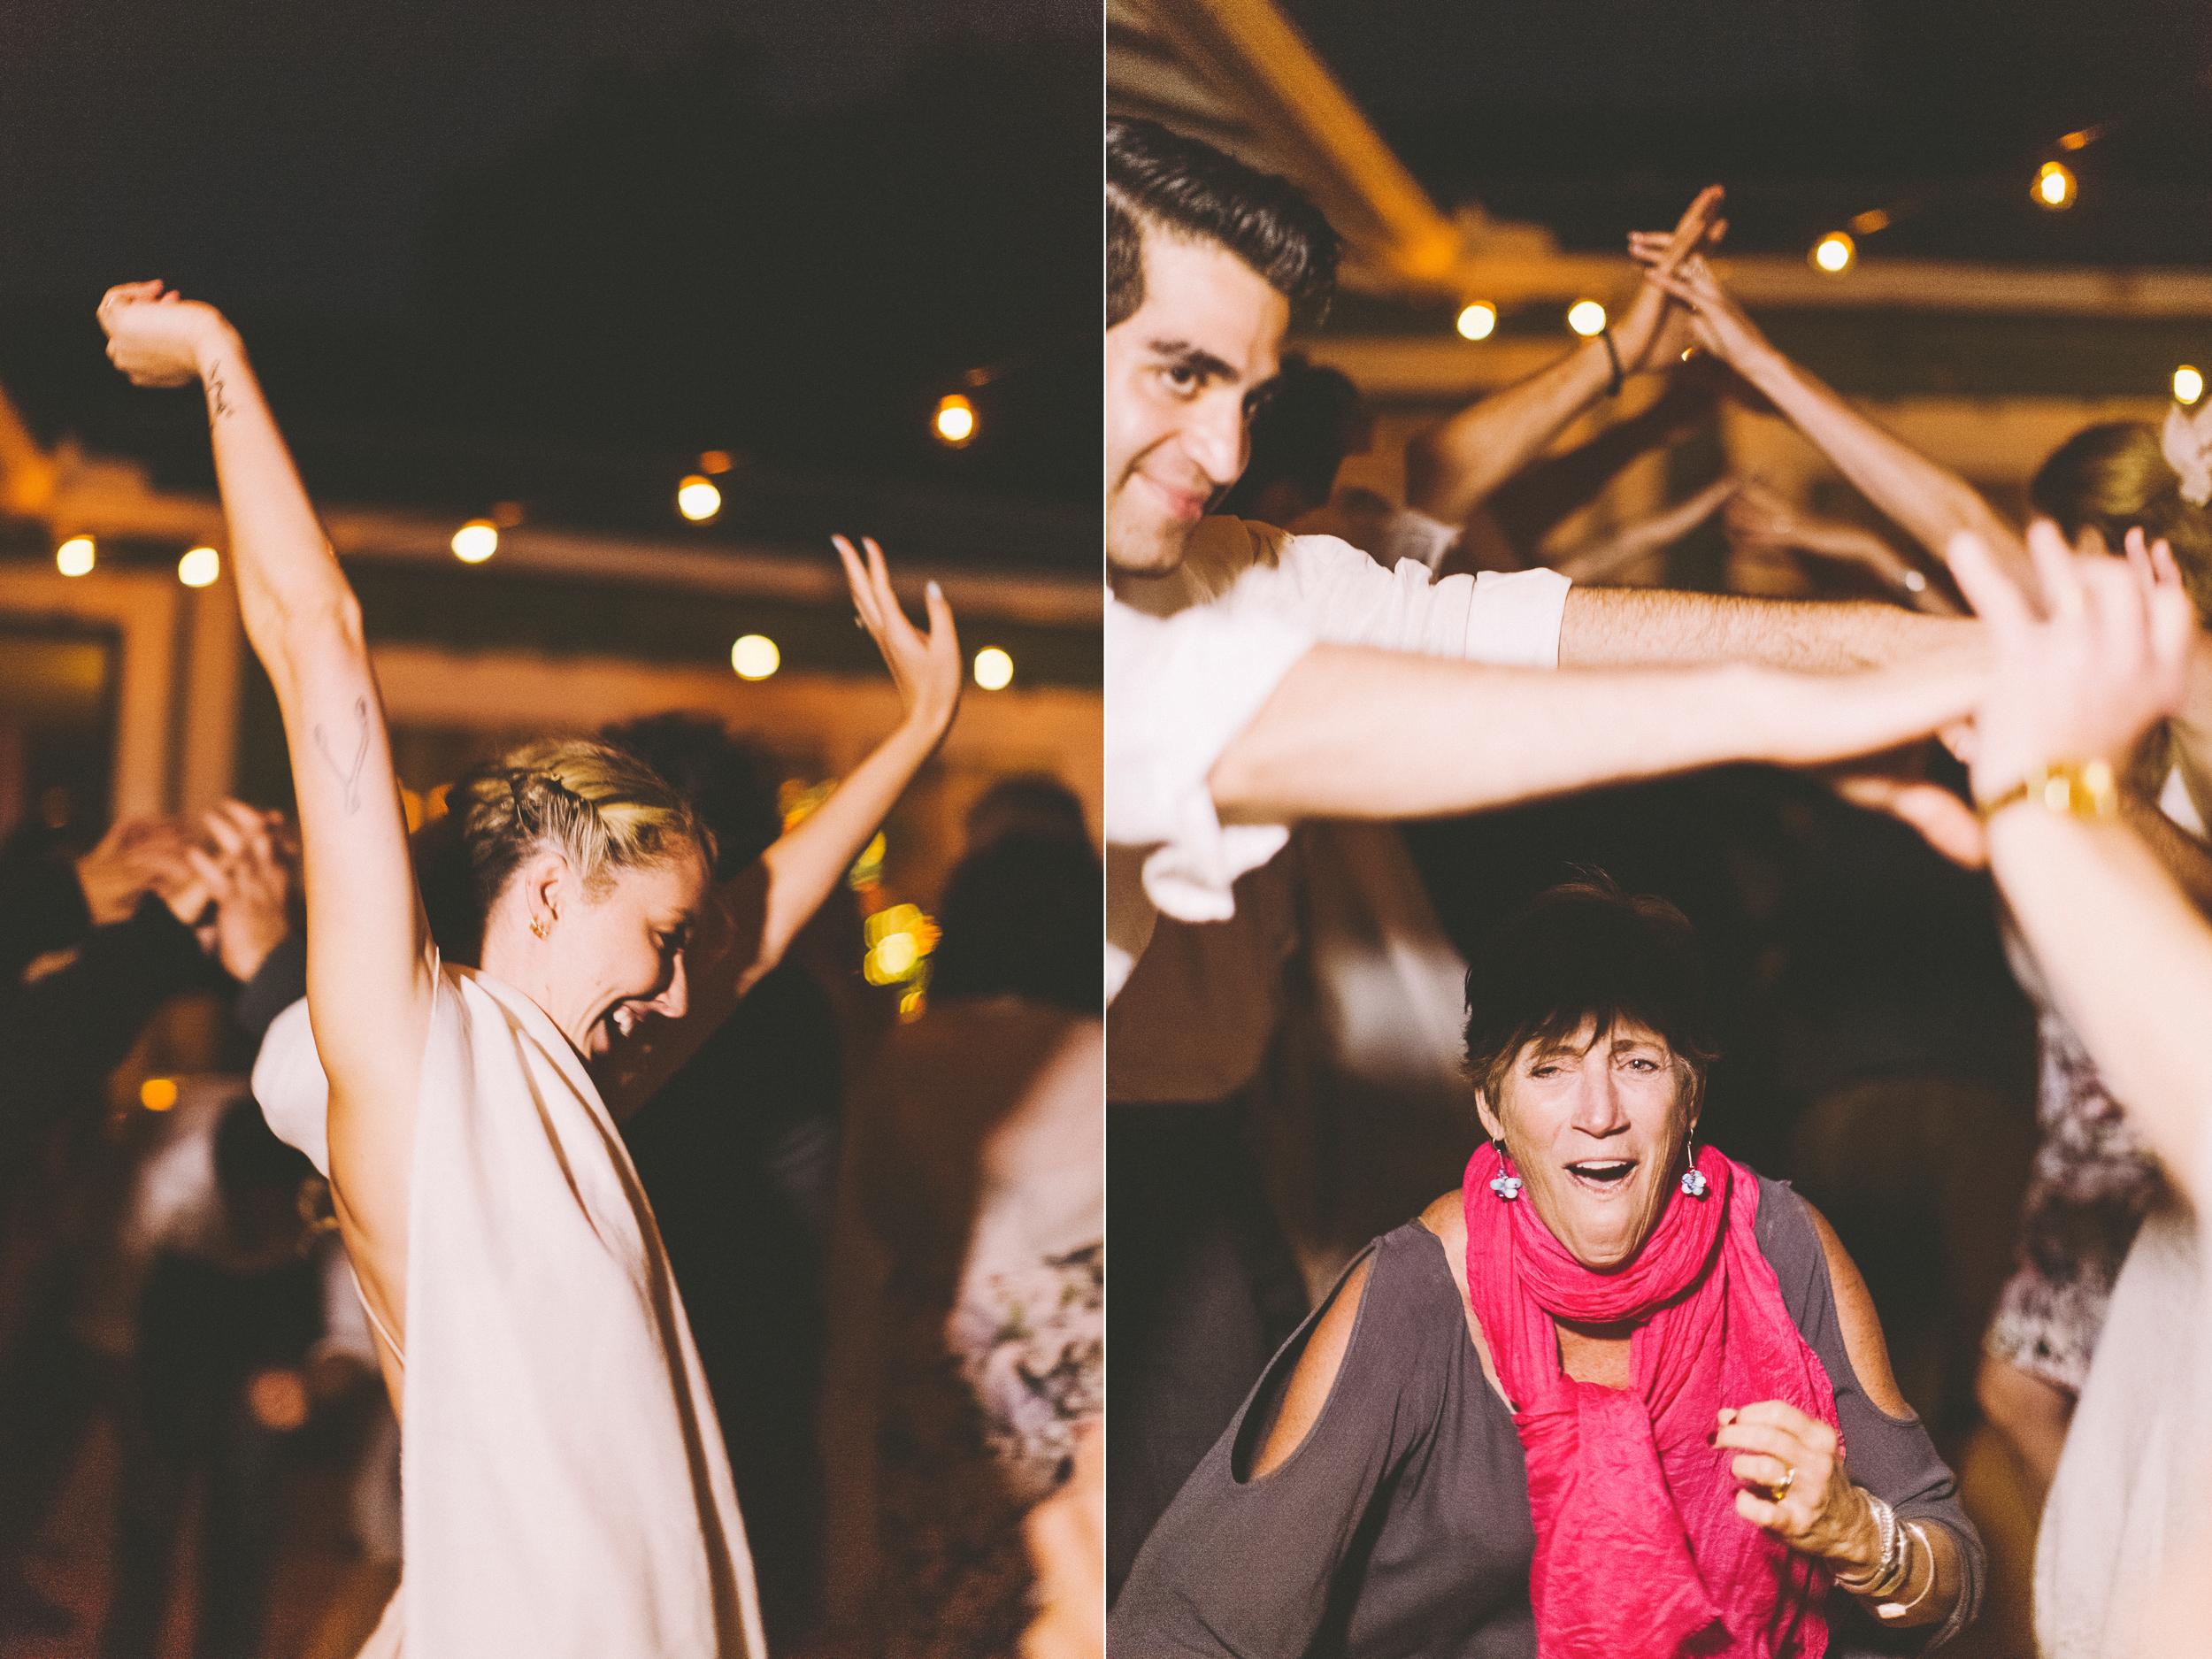 angie-diaz-photography-maui-wedding-129.jpg